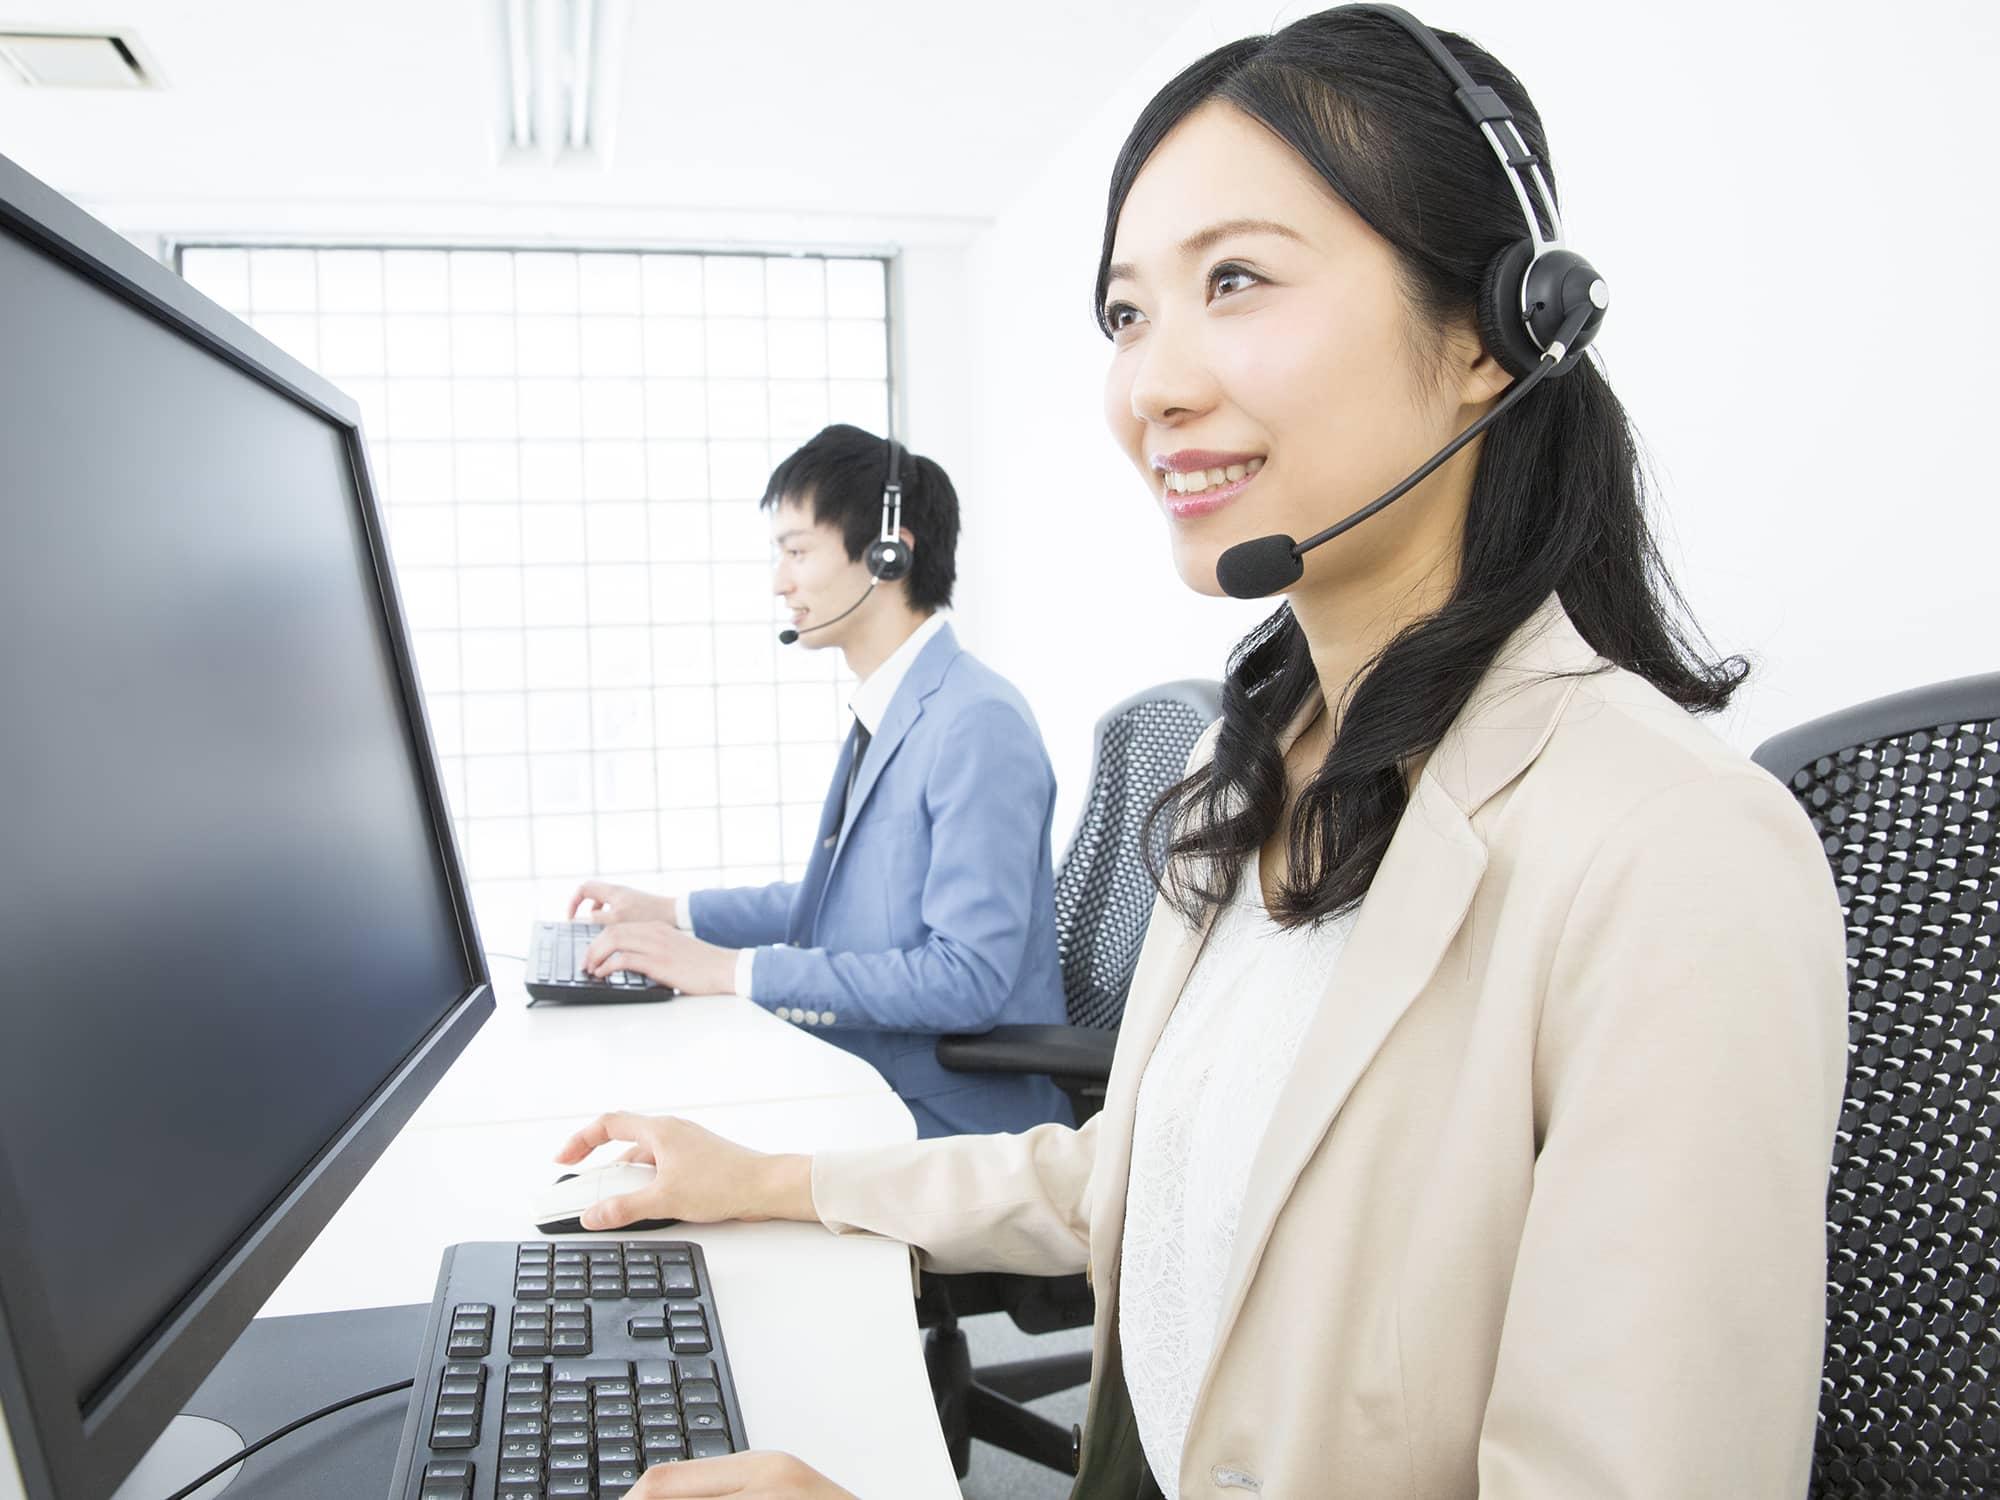 Level 3 Kundenservicekraft